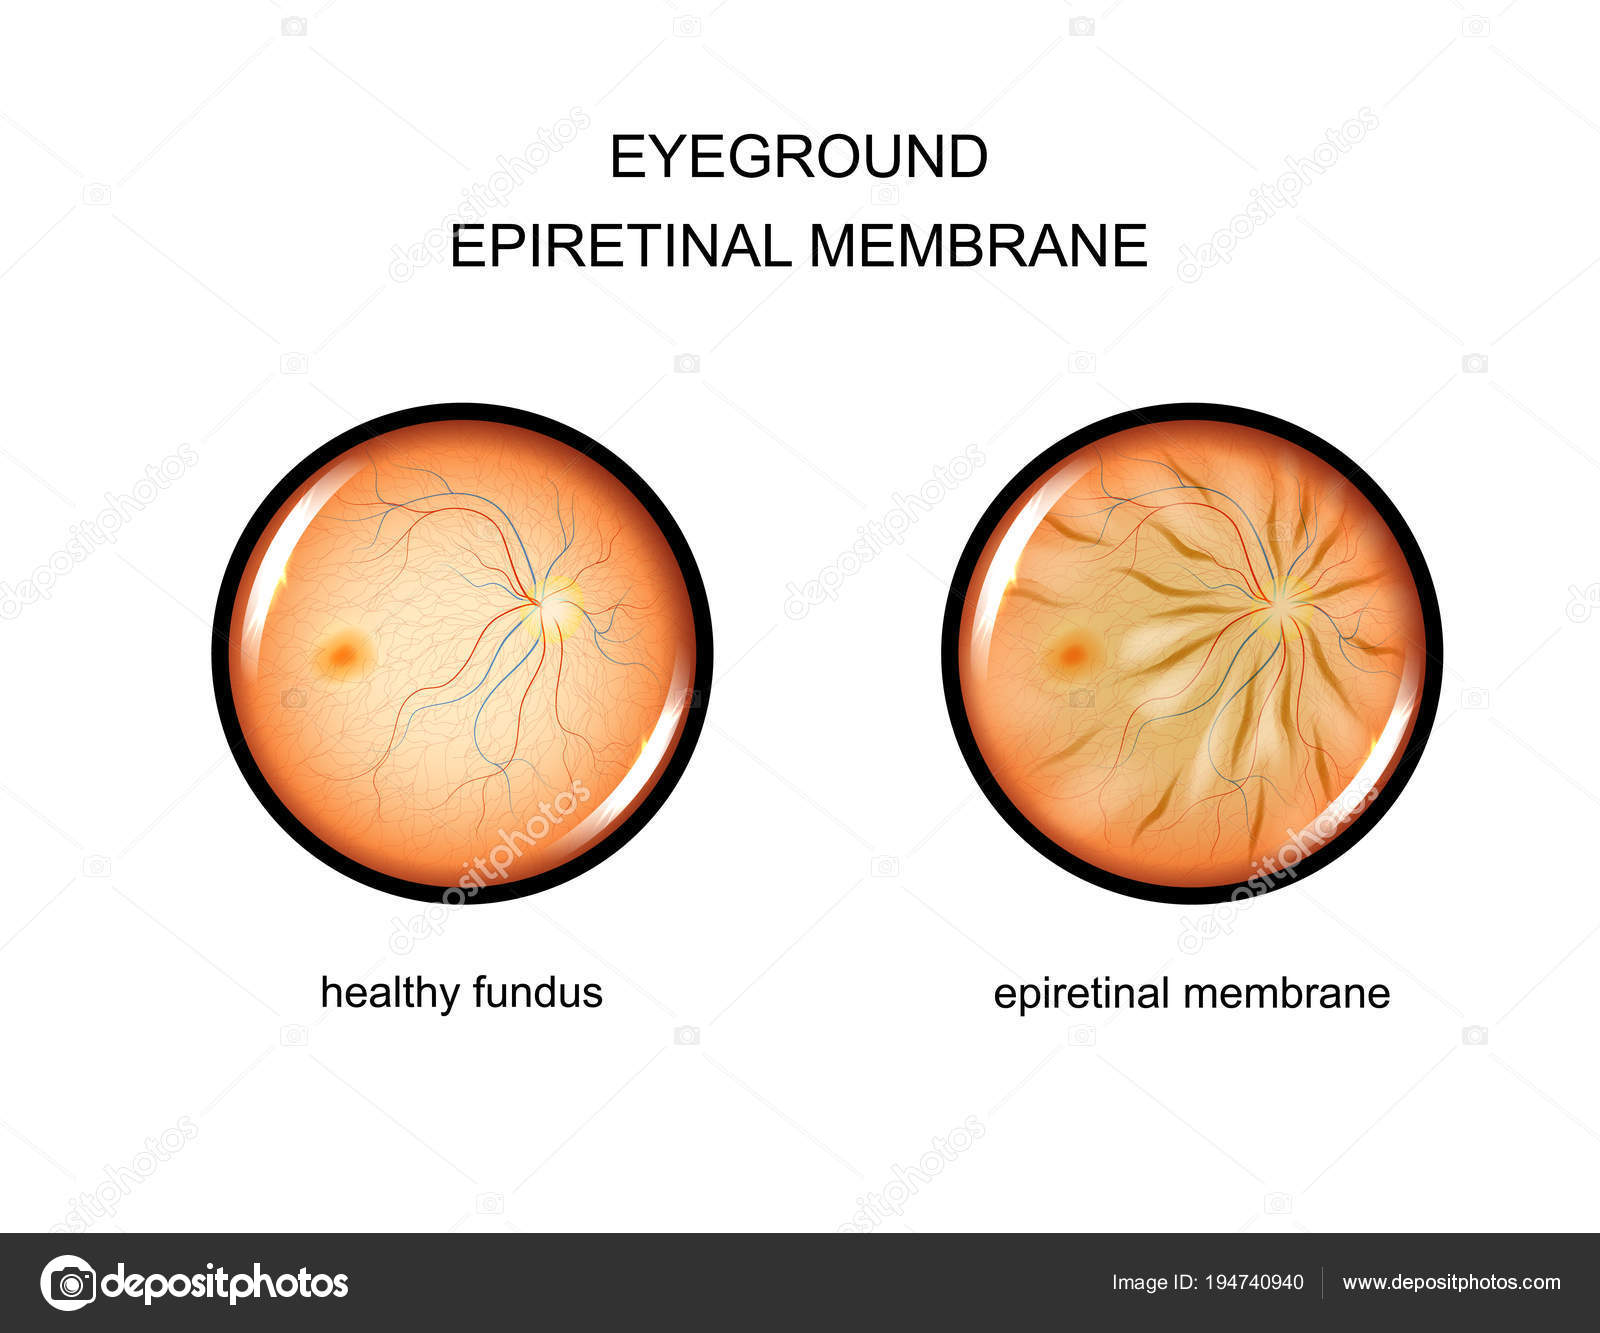 Vector Illustration Of The Fundus Epiretinal Membrane By Artemida Psy